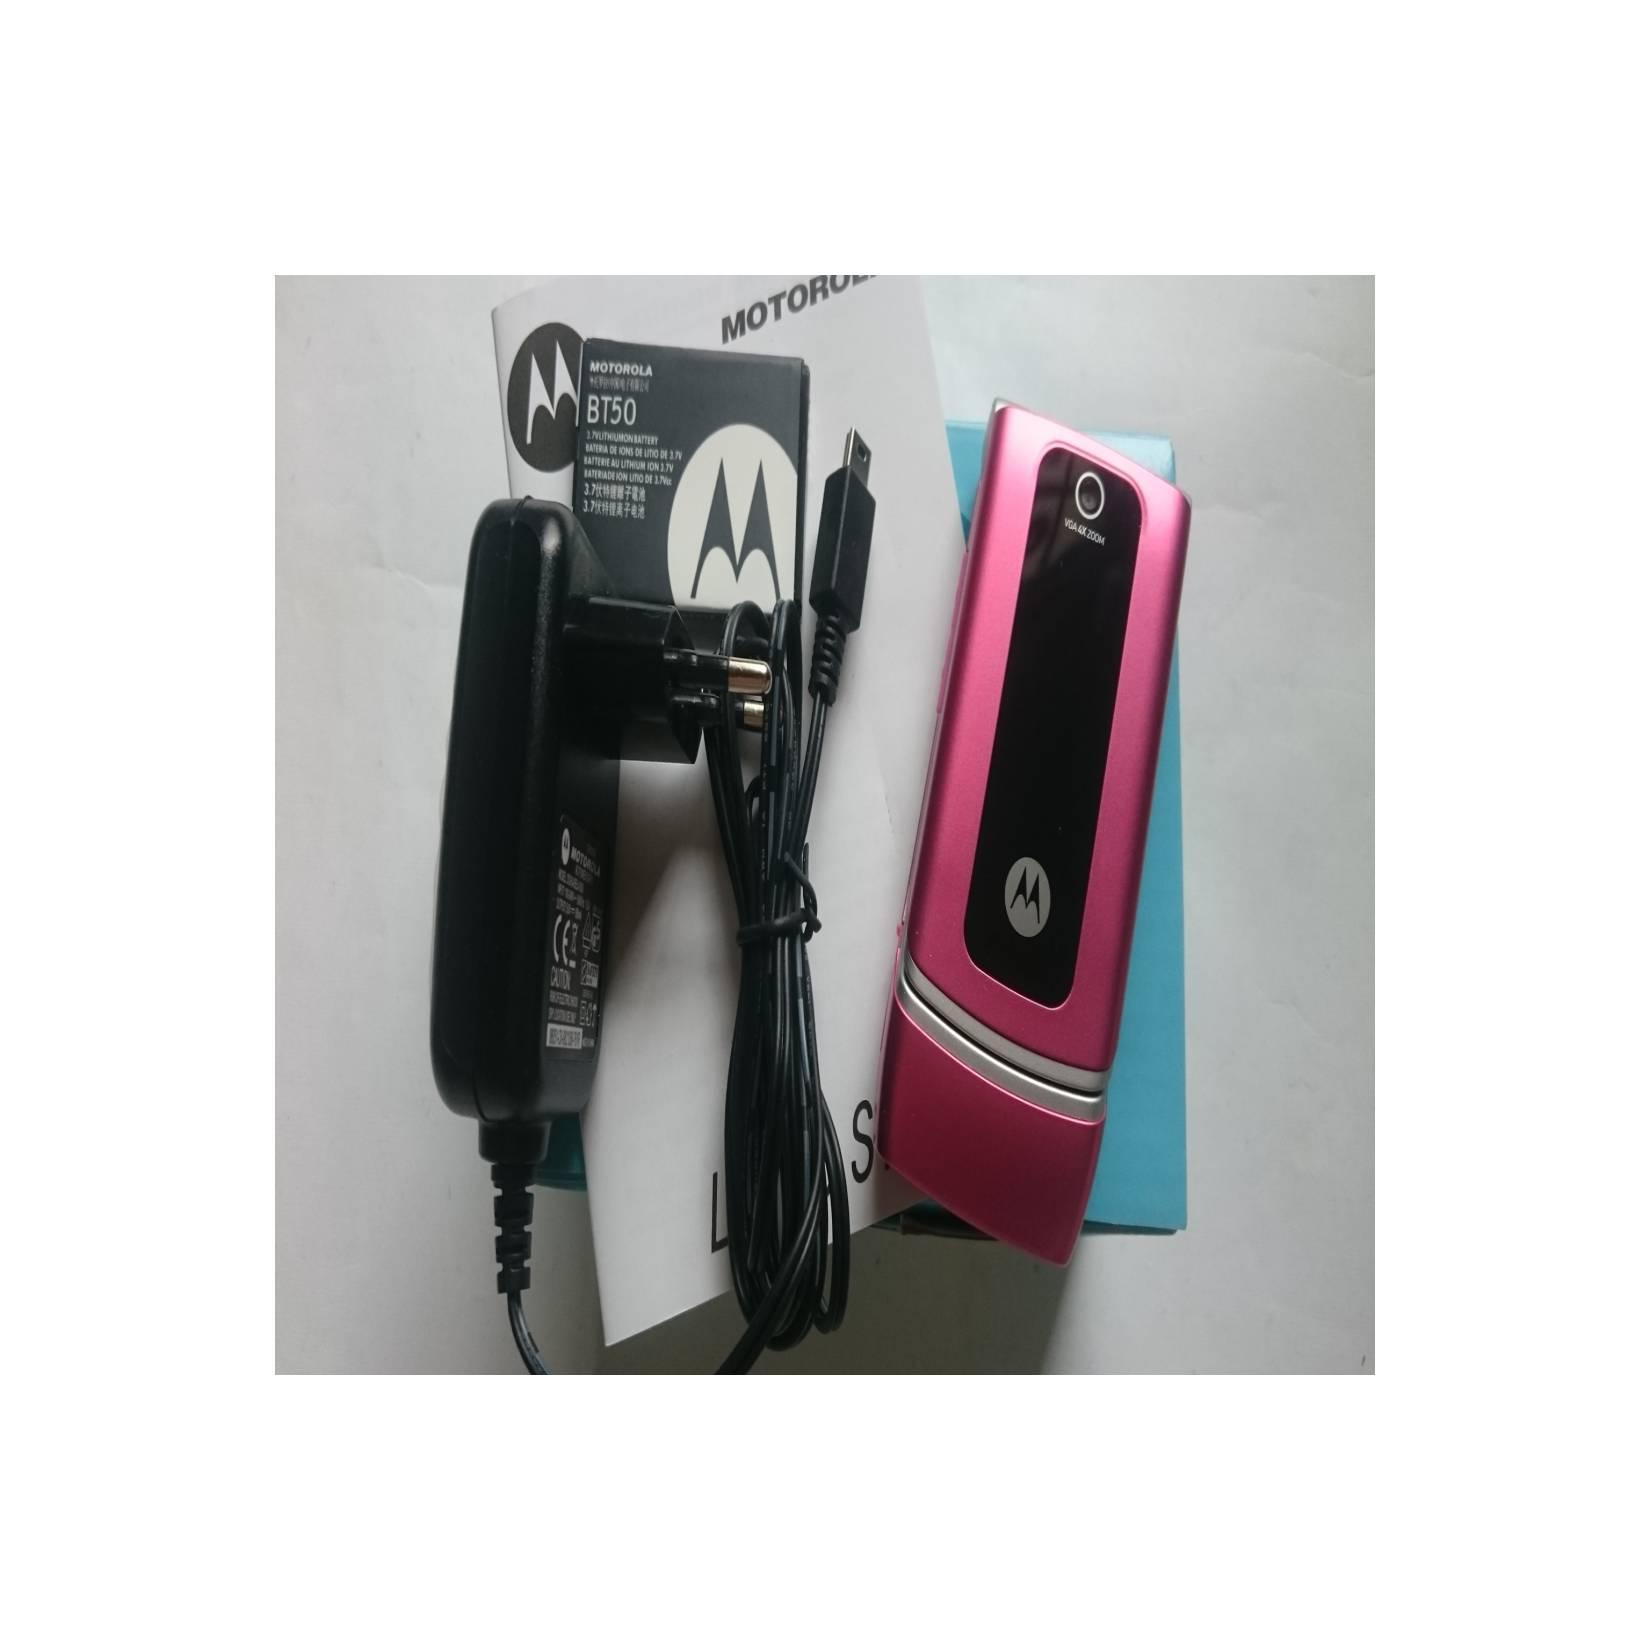 Motorola W375 Flip - Clamshell Pink - HP Jadul Original